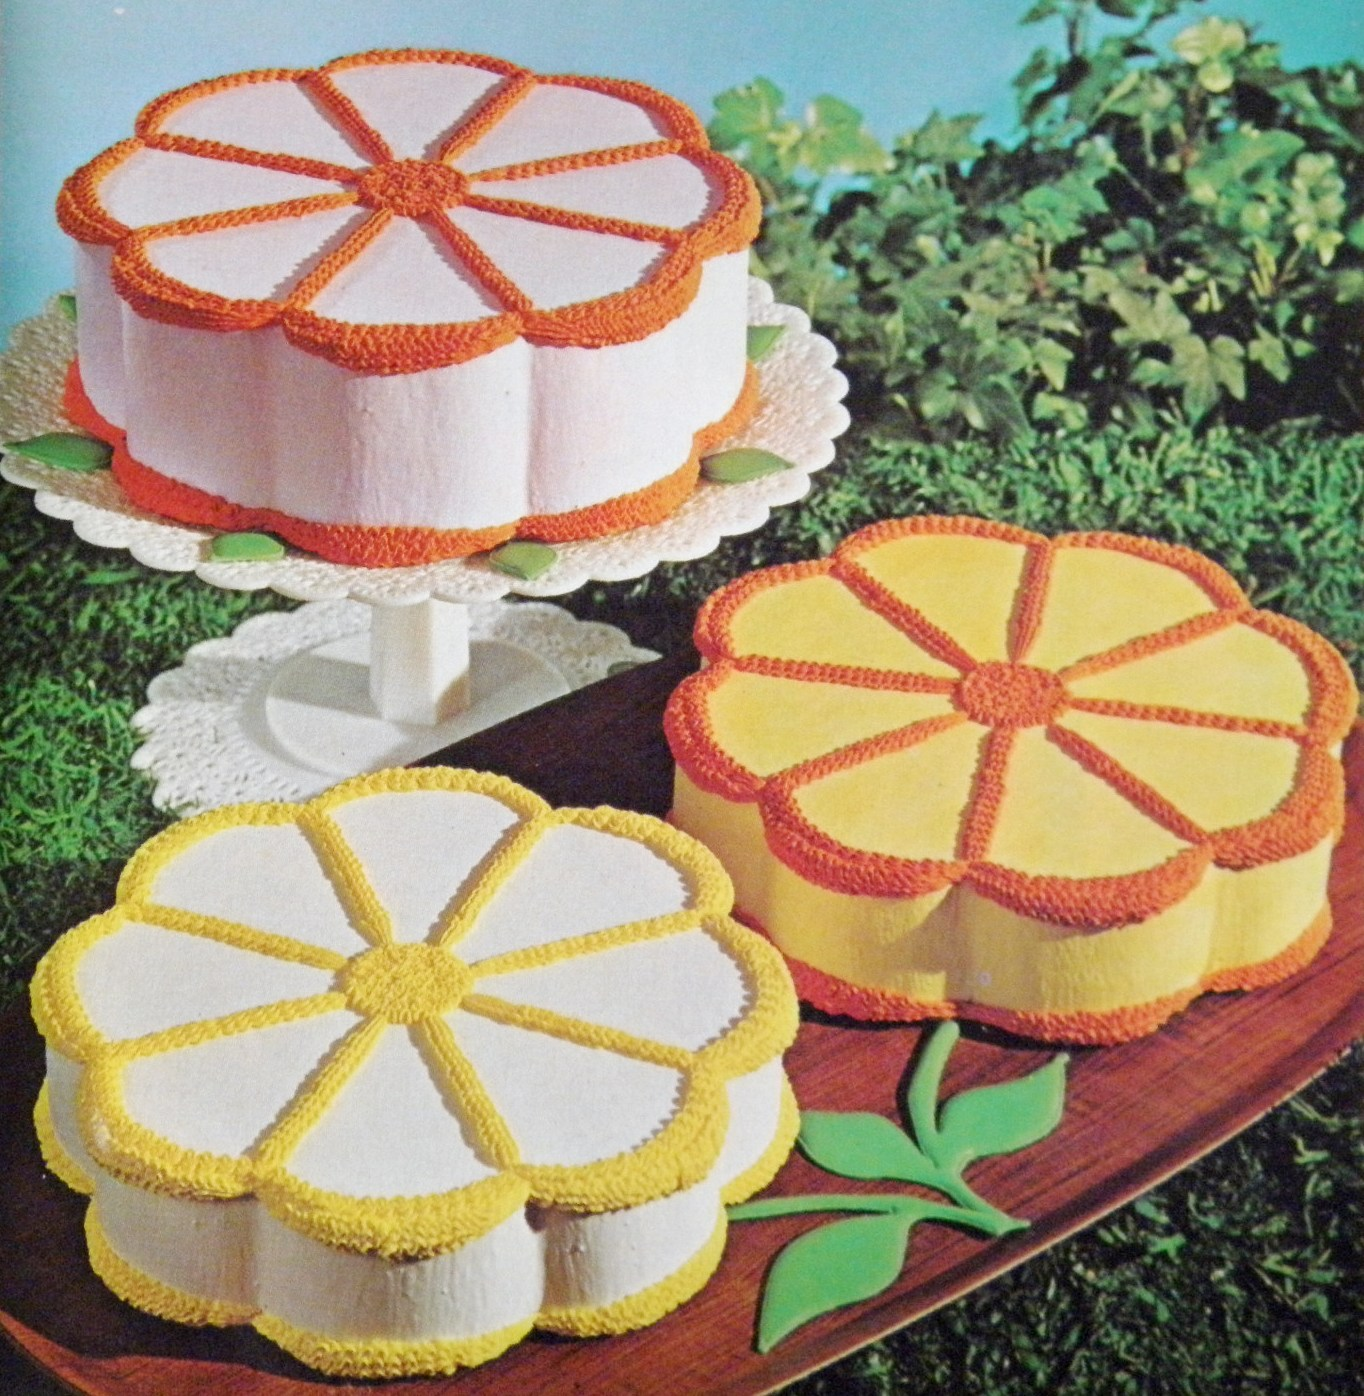 How To Make A Daisy Shaped Cake